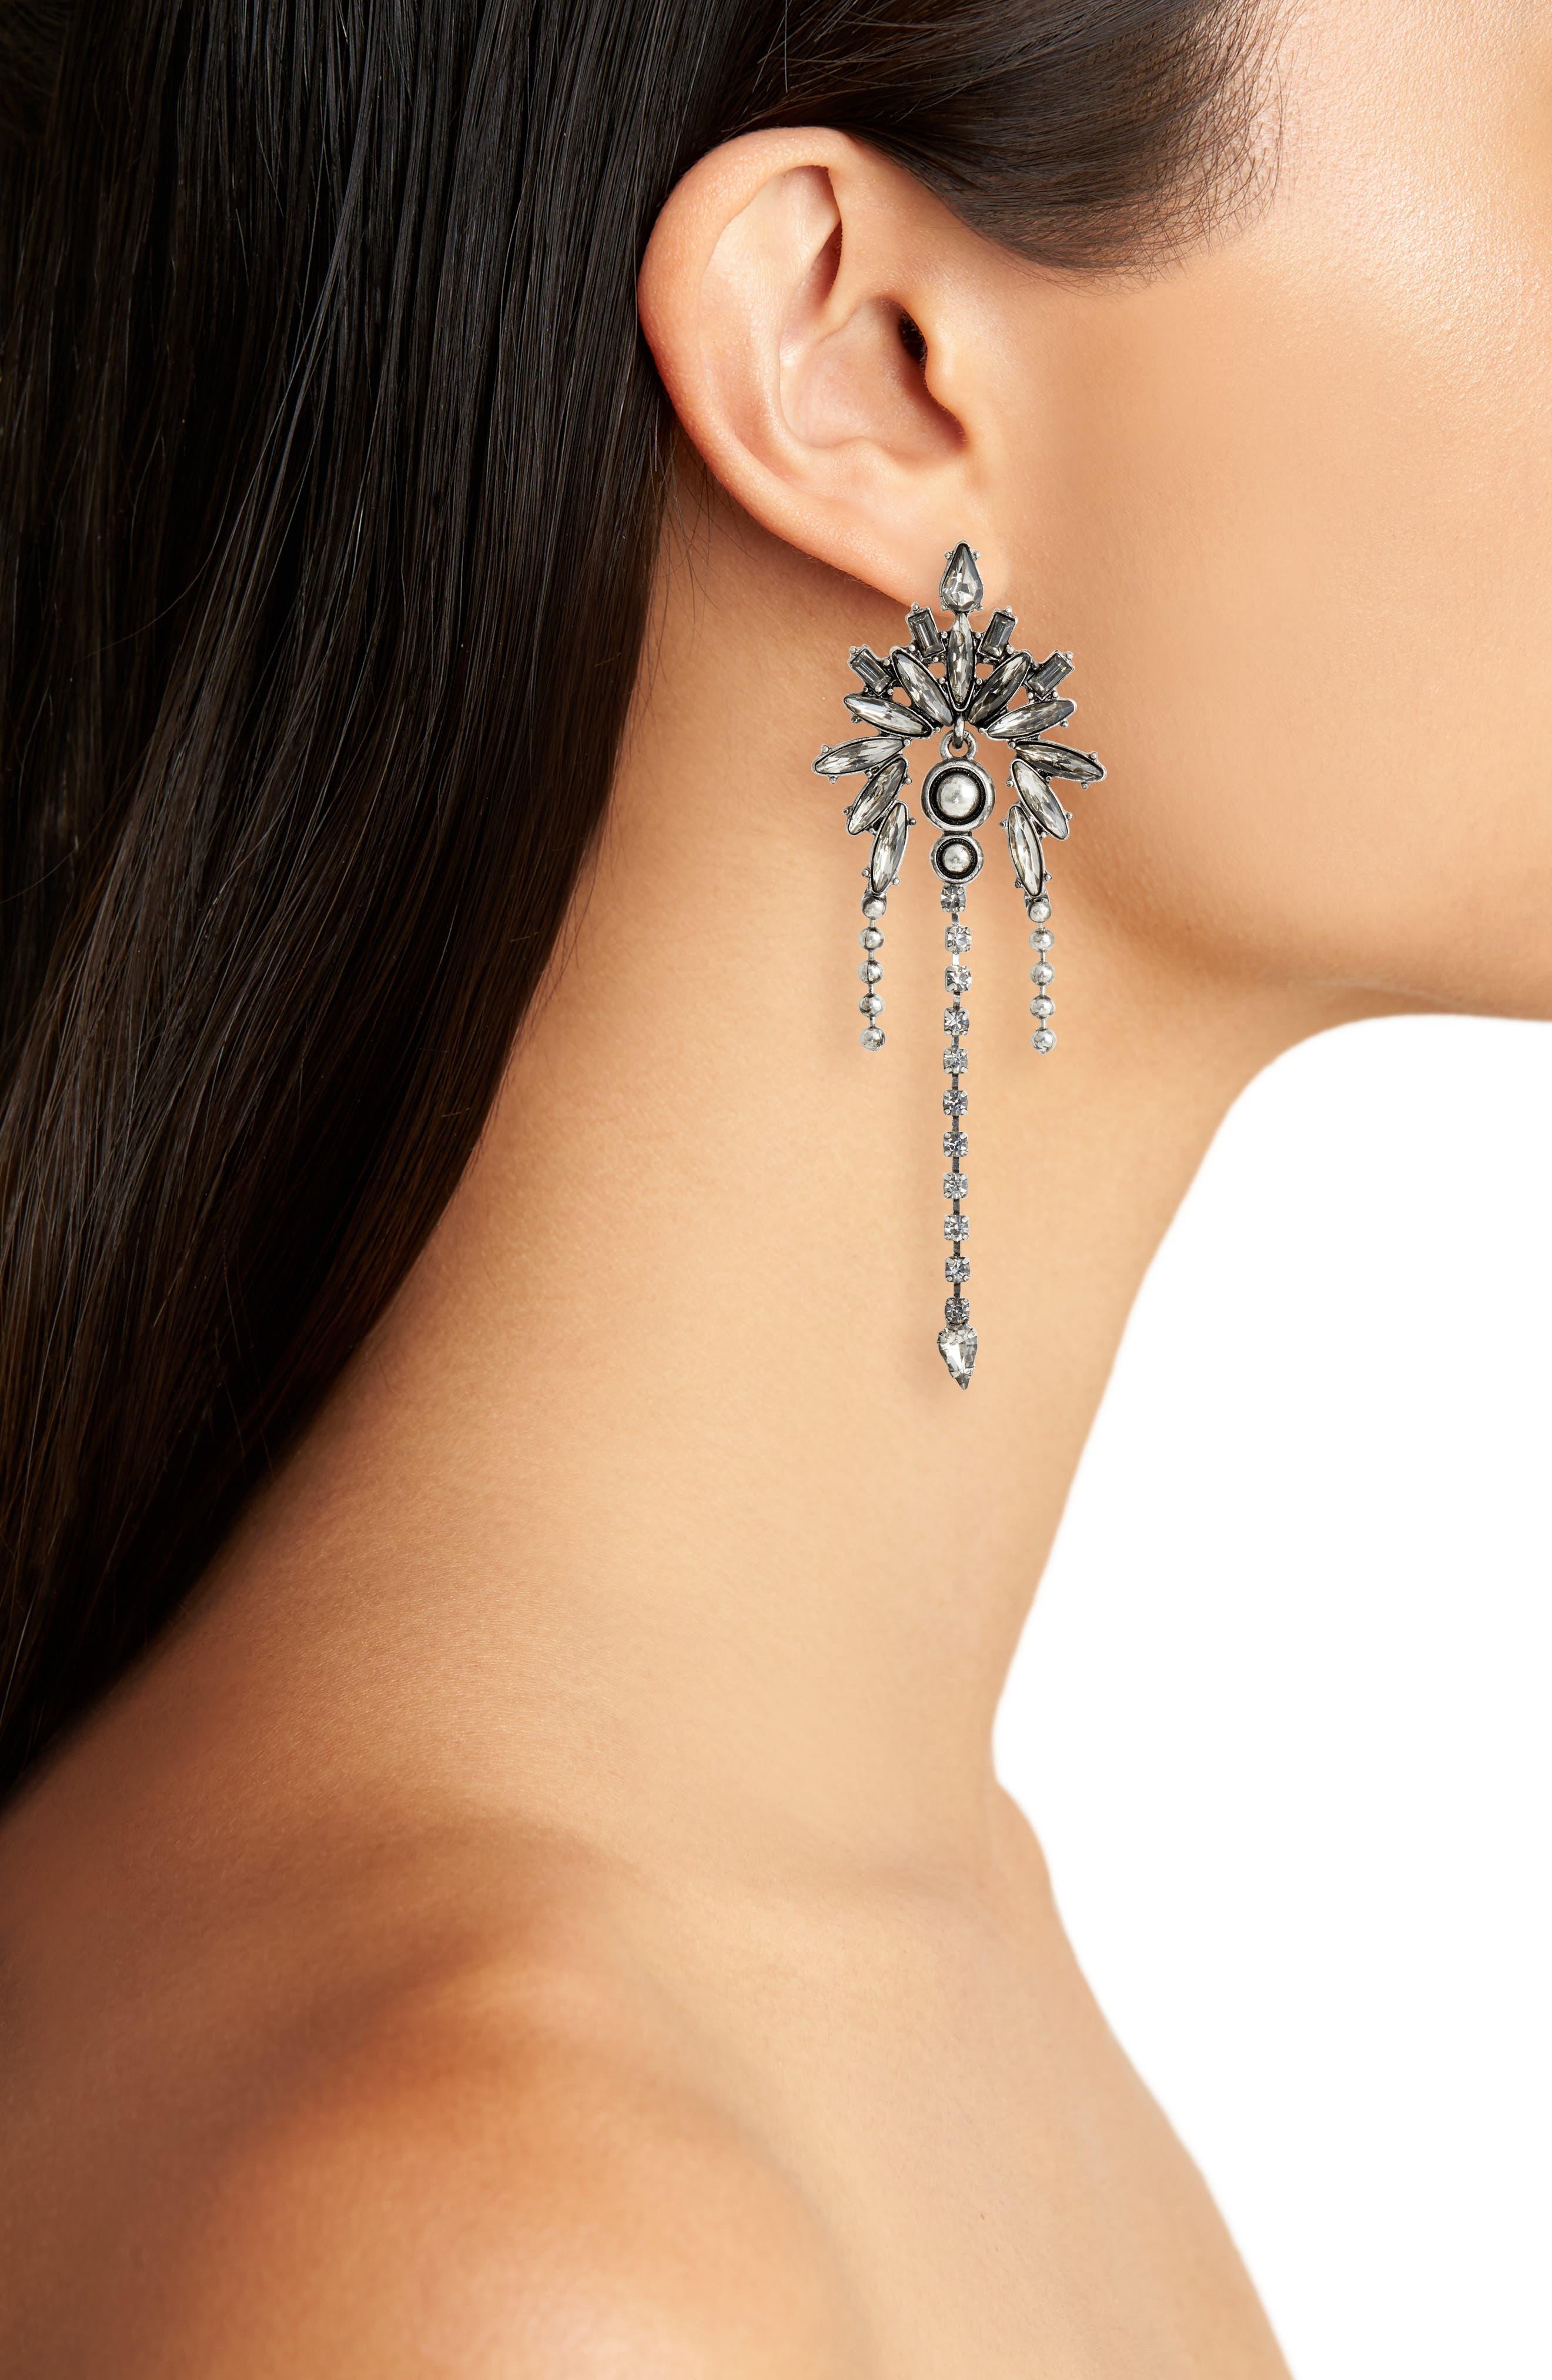 Crystal Chandelier Earrings,                             Alternate thumbnail 2, color,                             040